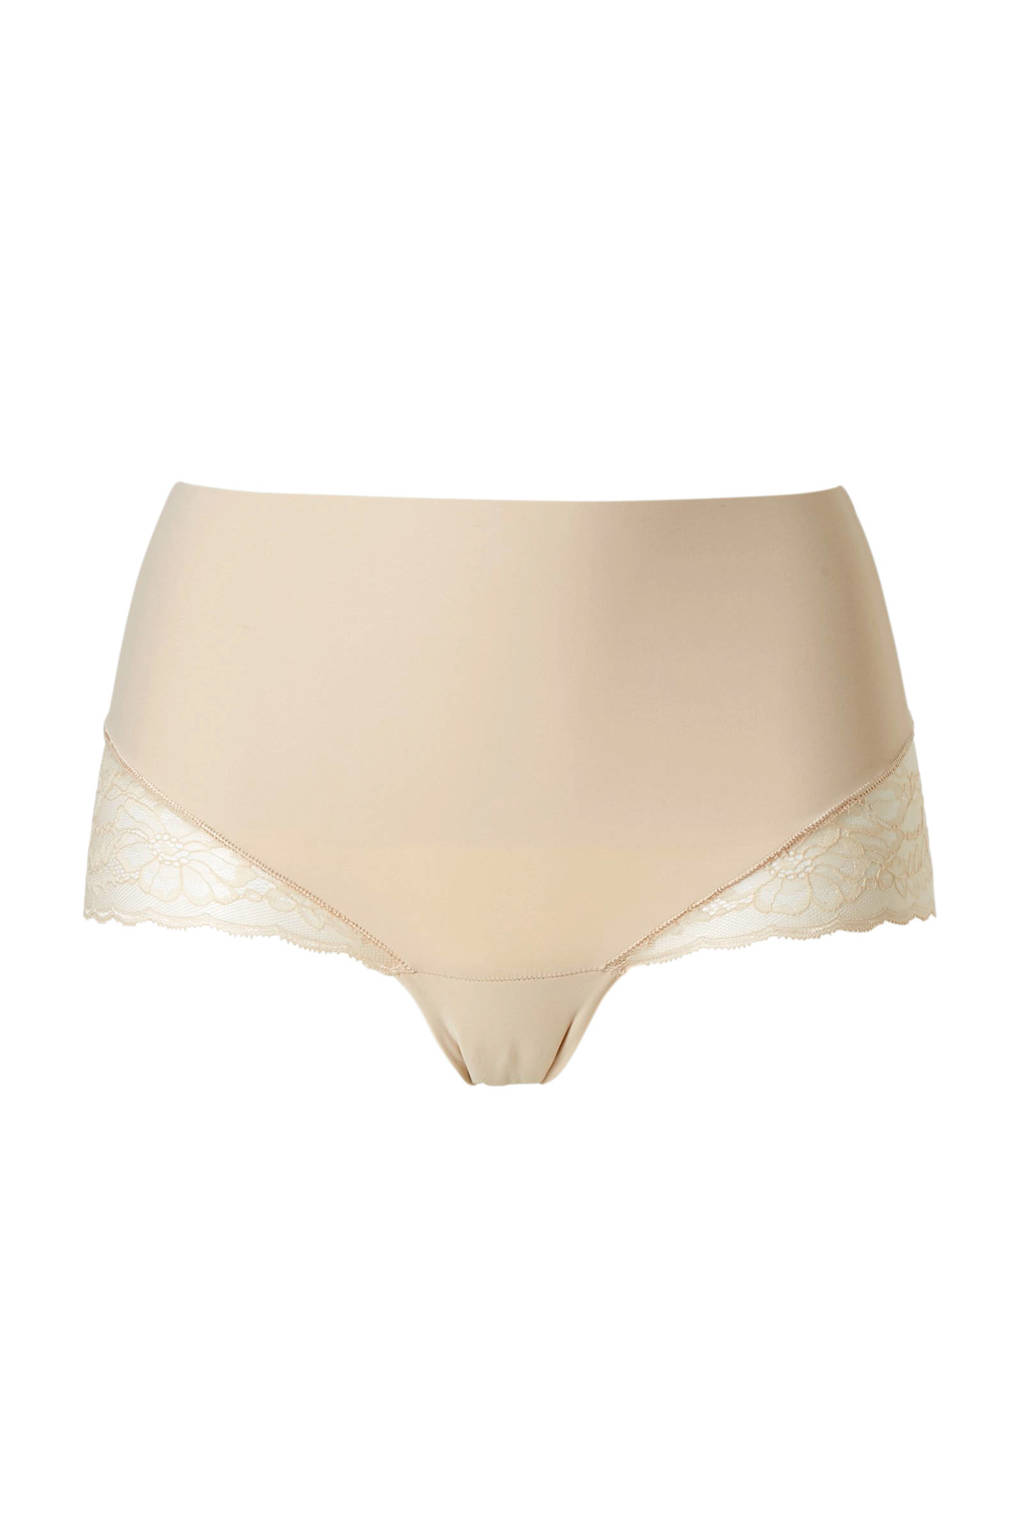 MAGIC Bodyfashion corrigerende slip Tummy Shaper Lace beige, Beige